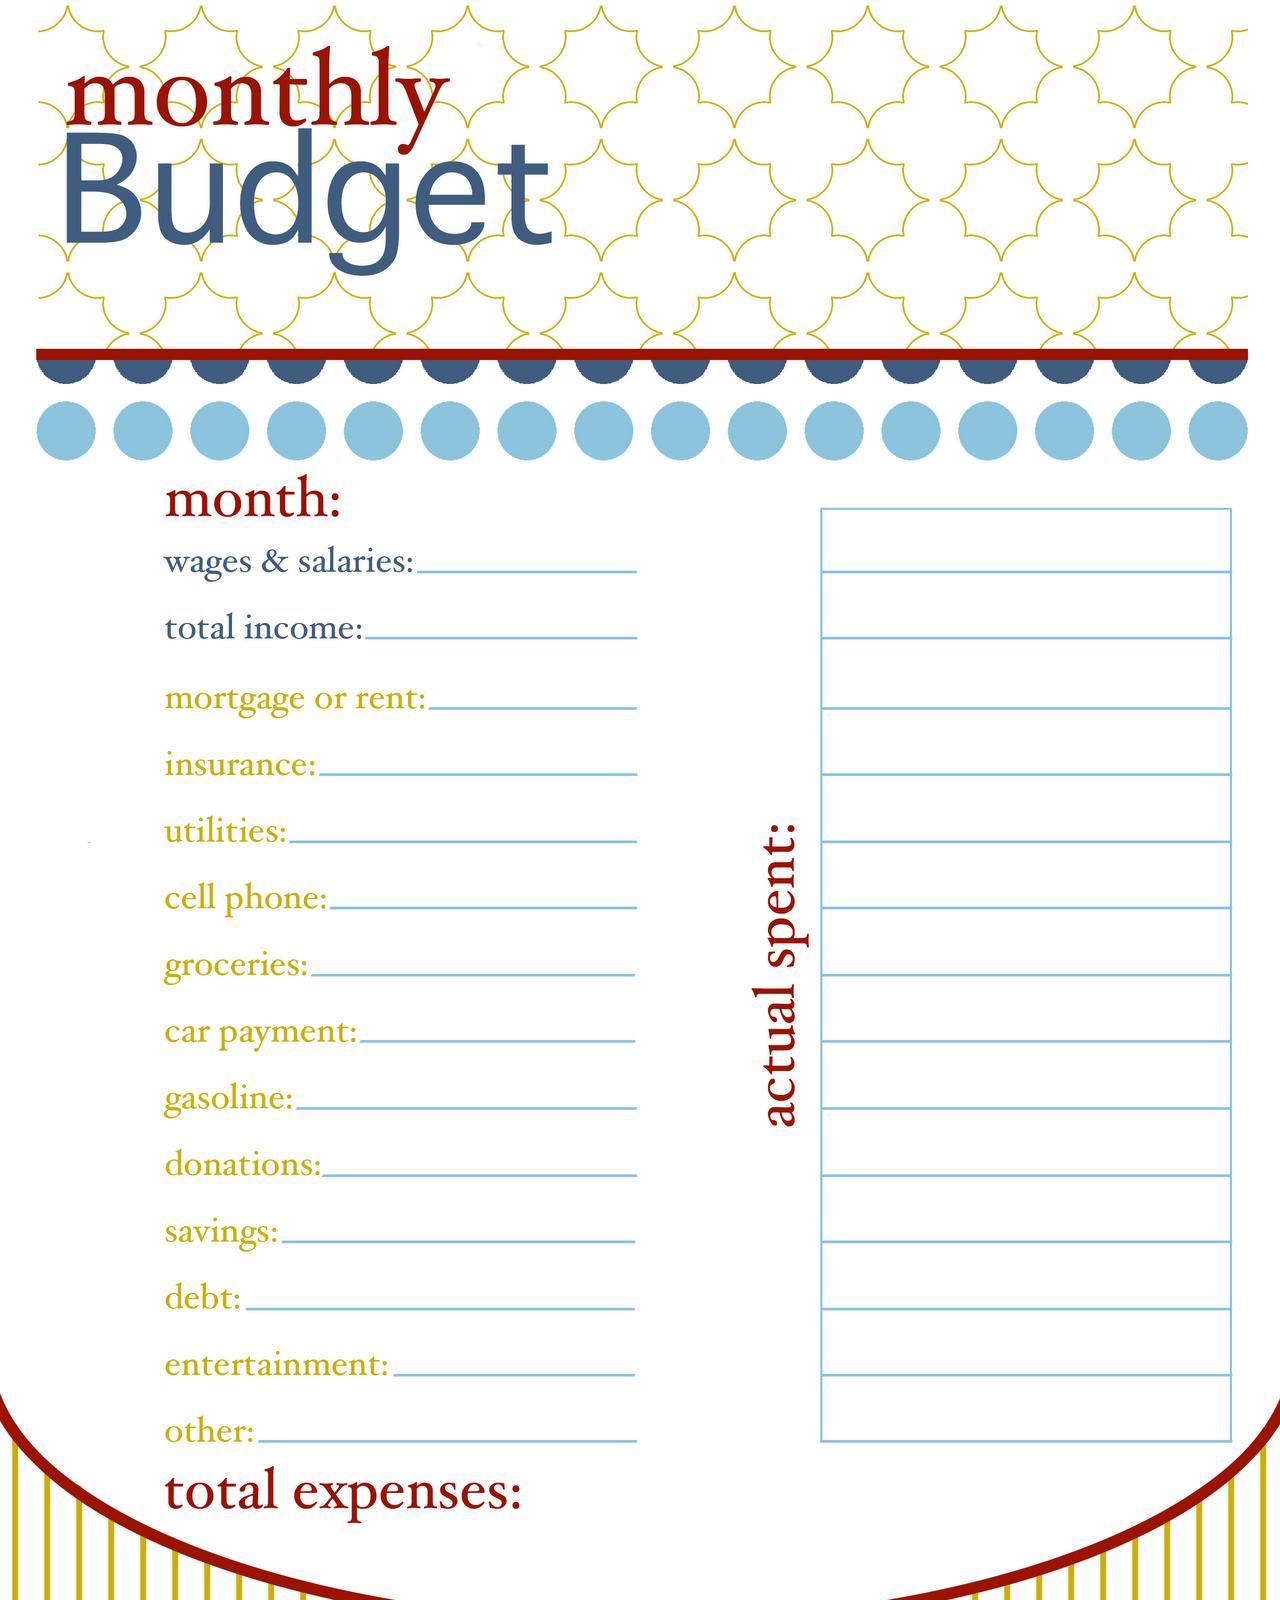 Free Financial Spreadsheet Templates finance spreadsheet template – Personal Finance Worksheets